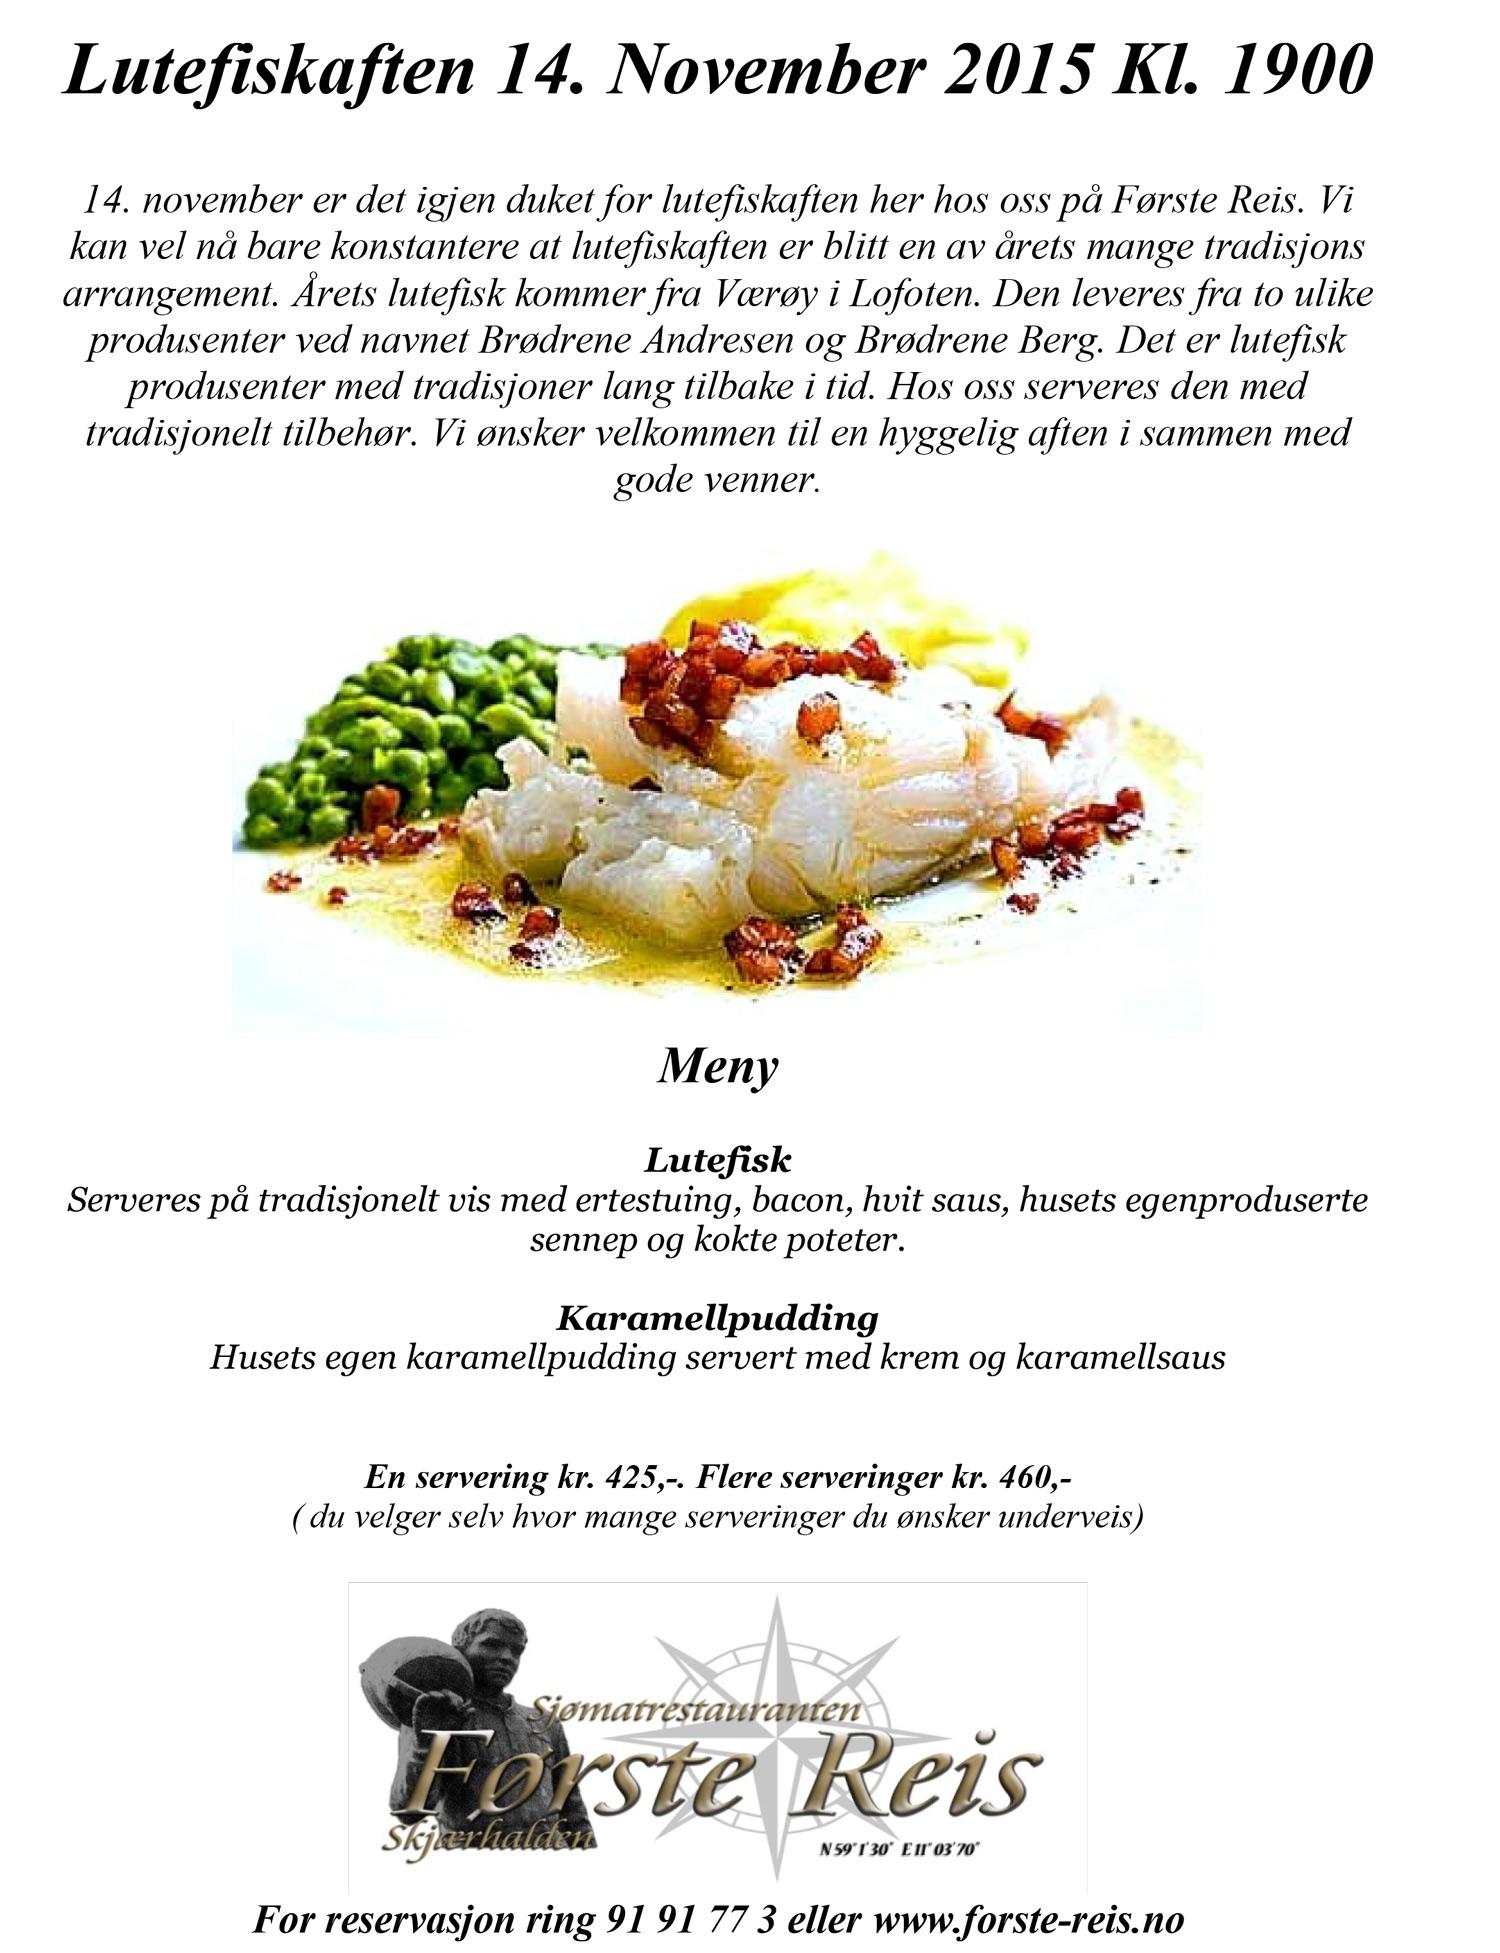 Sjømatrestauranten første reis